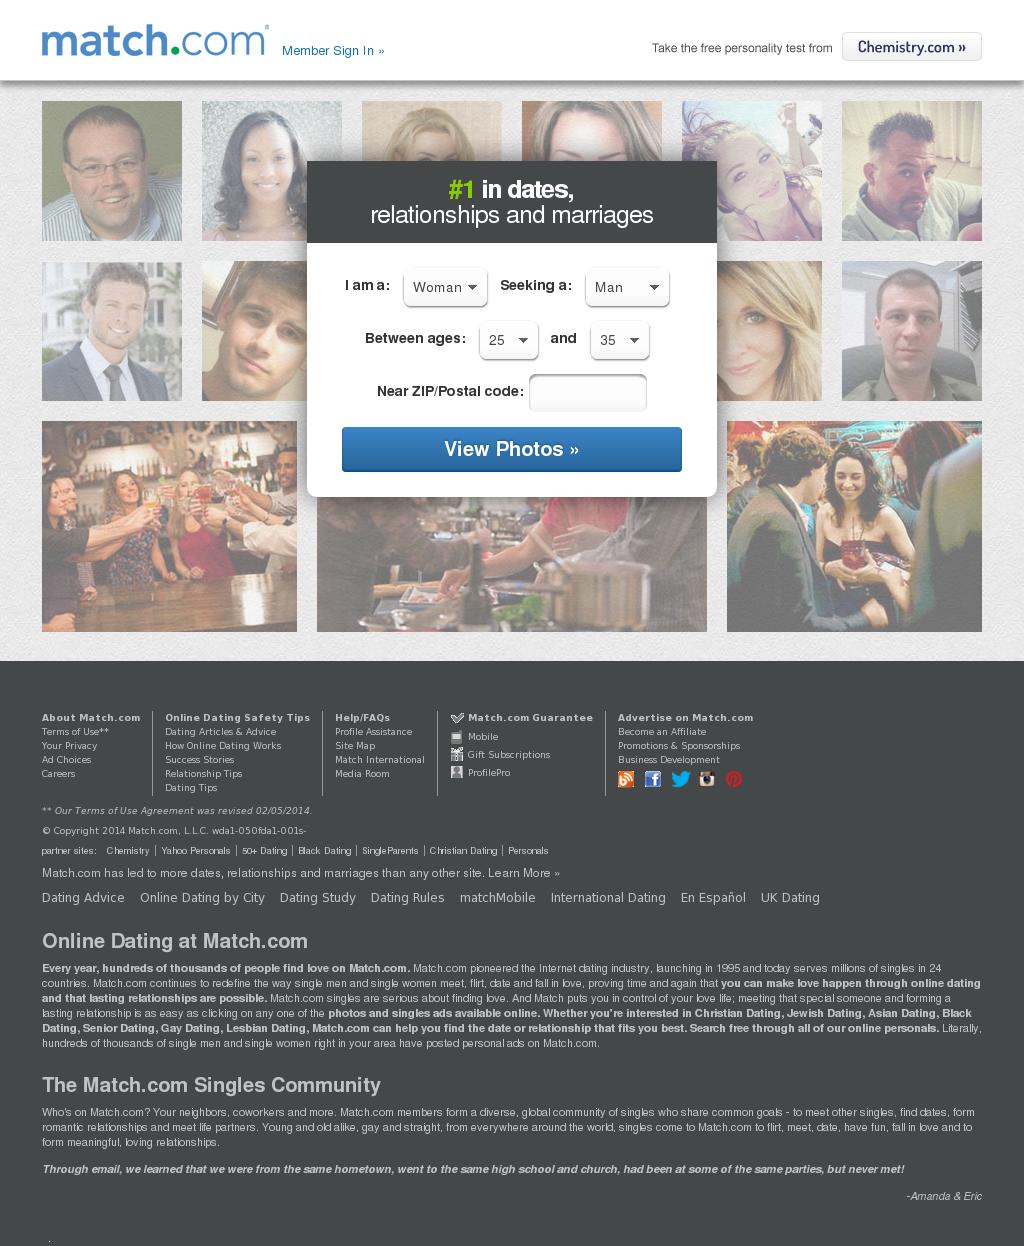 match.com dating advice